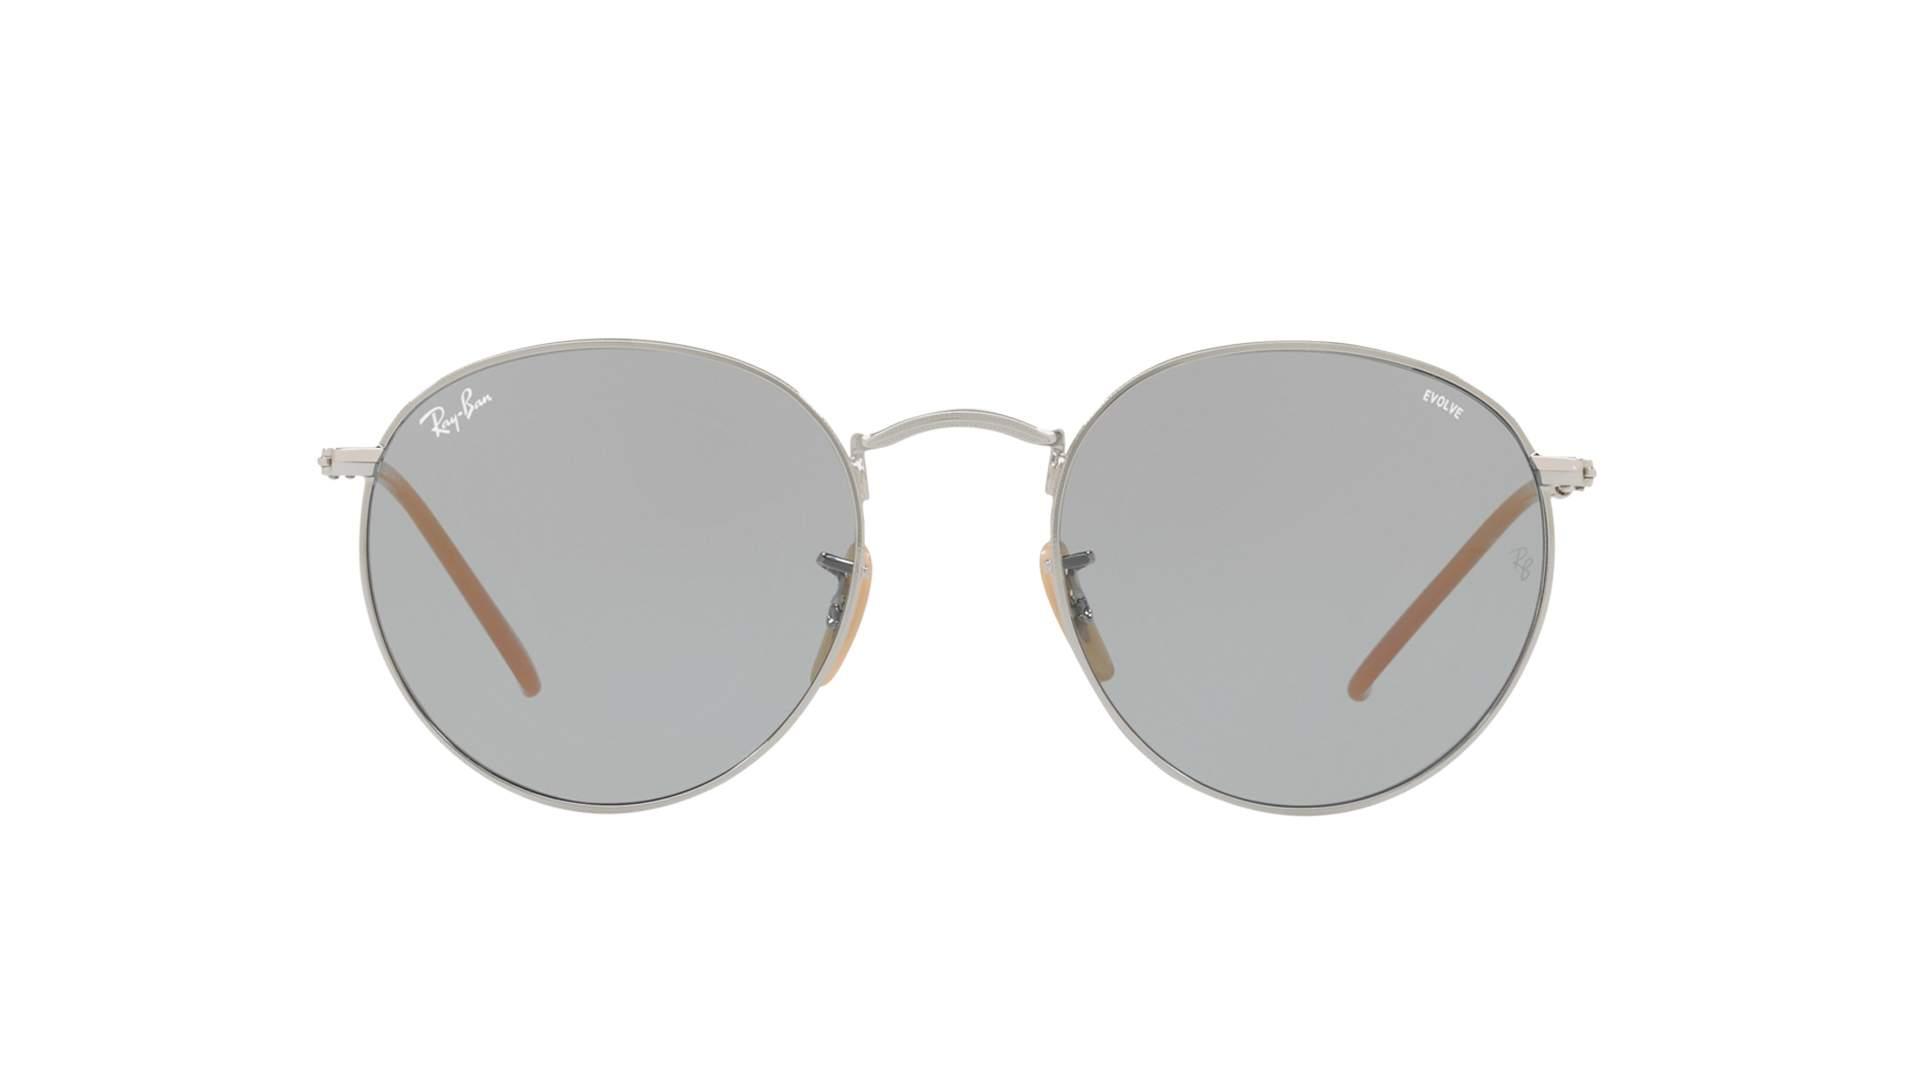 b5c308c9a6aba Sunglasses Ray-Ban Round Evolve Silver RB3447 9065 I5 50-51 Medium  Photochromic